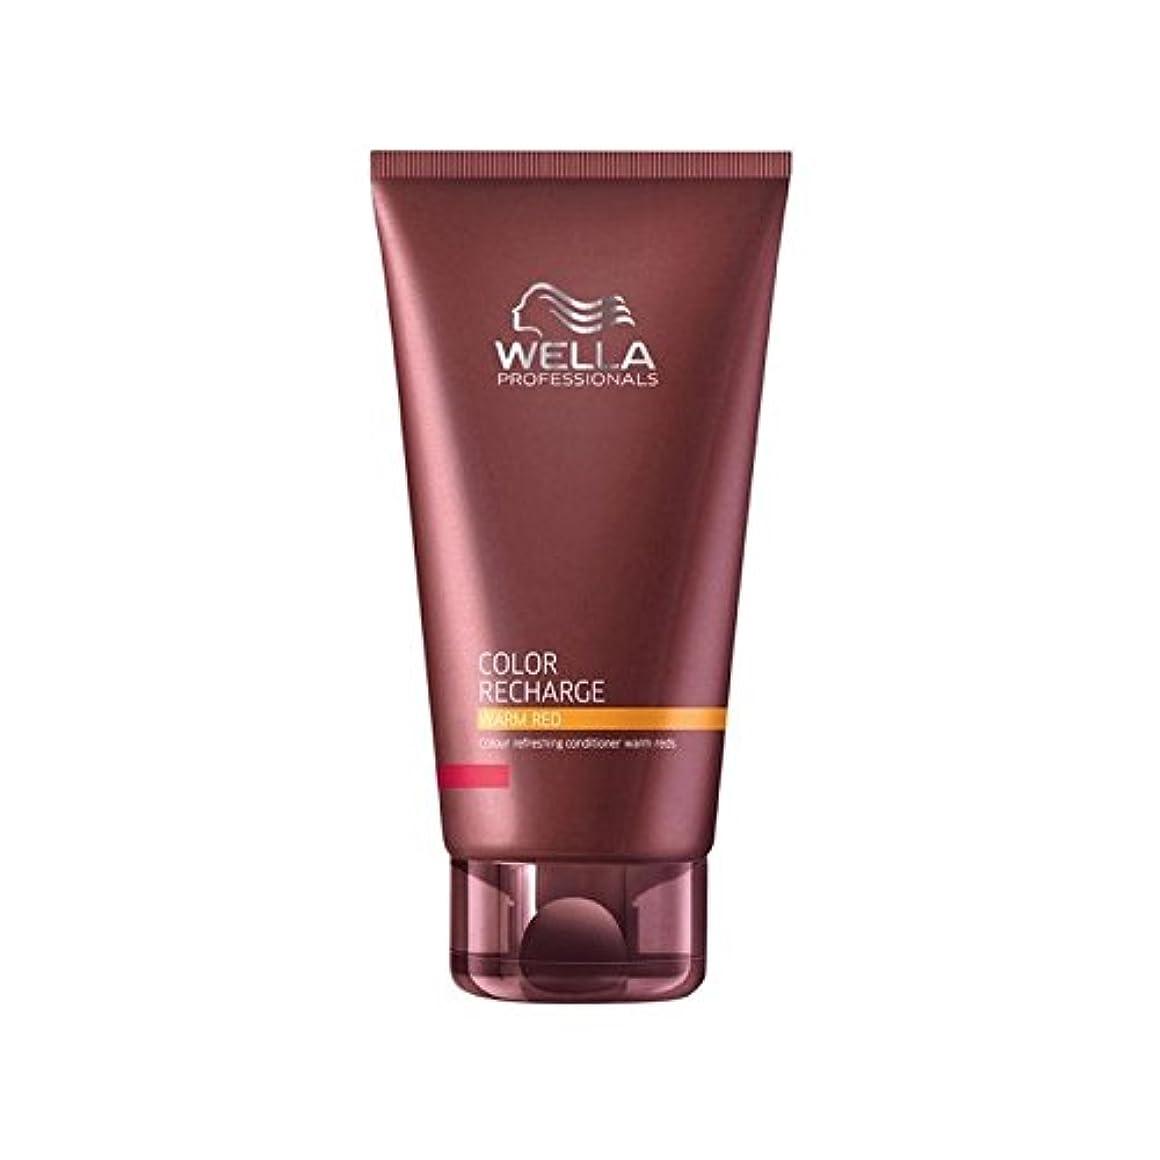 Wella Professionals Color Recharge Conditioner Warm Red (200ml) (Pack of 6) - ウエラ専門家のカラー再充電コンディショナー暖かい赤(200ミリリットル...